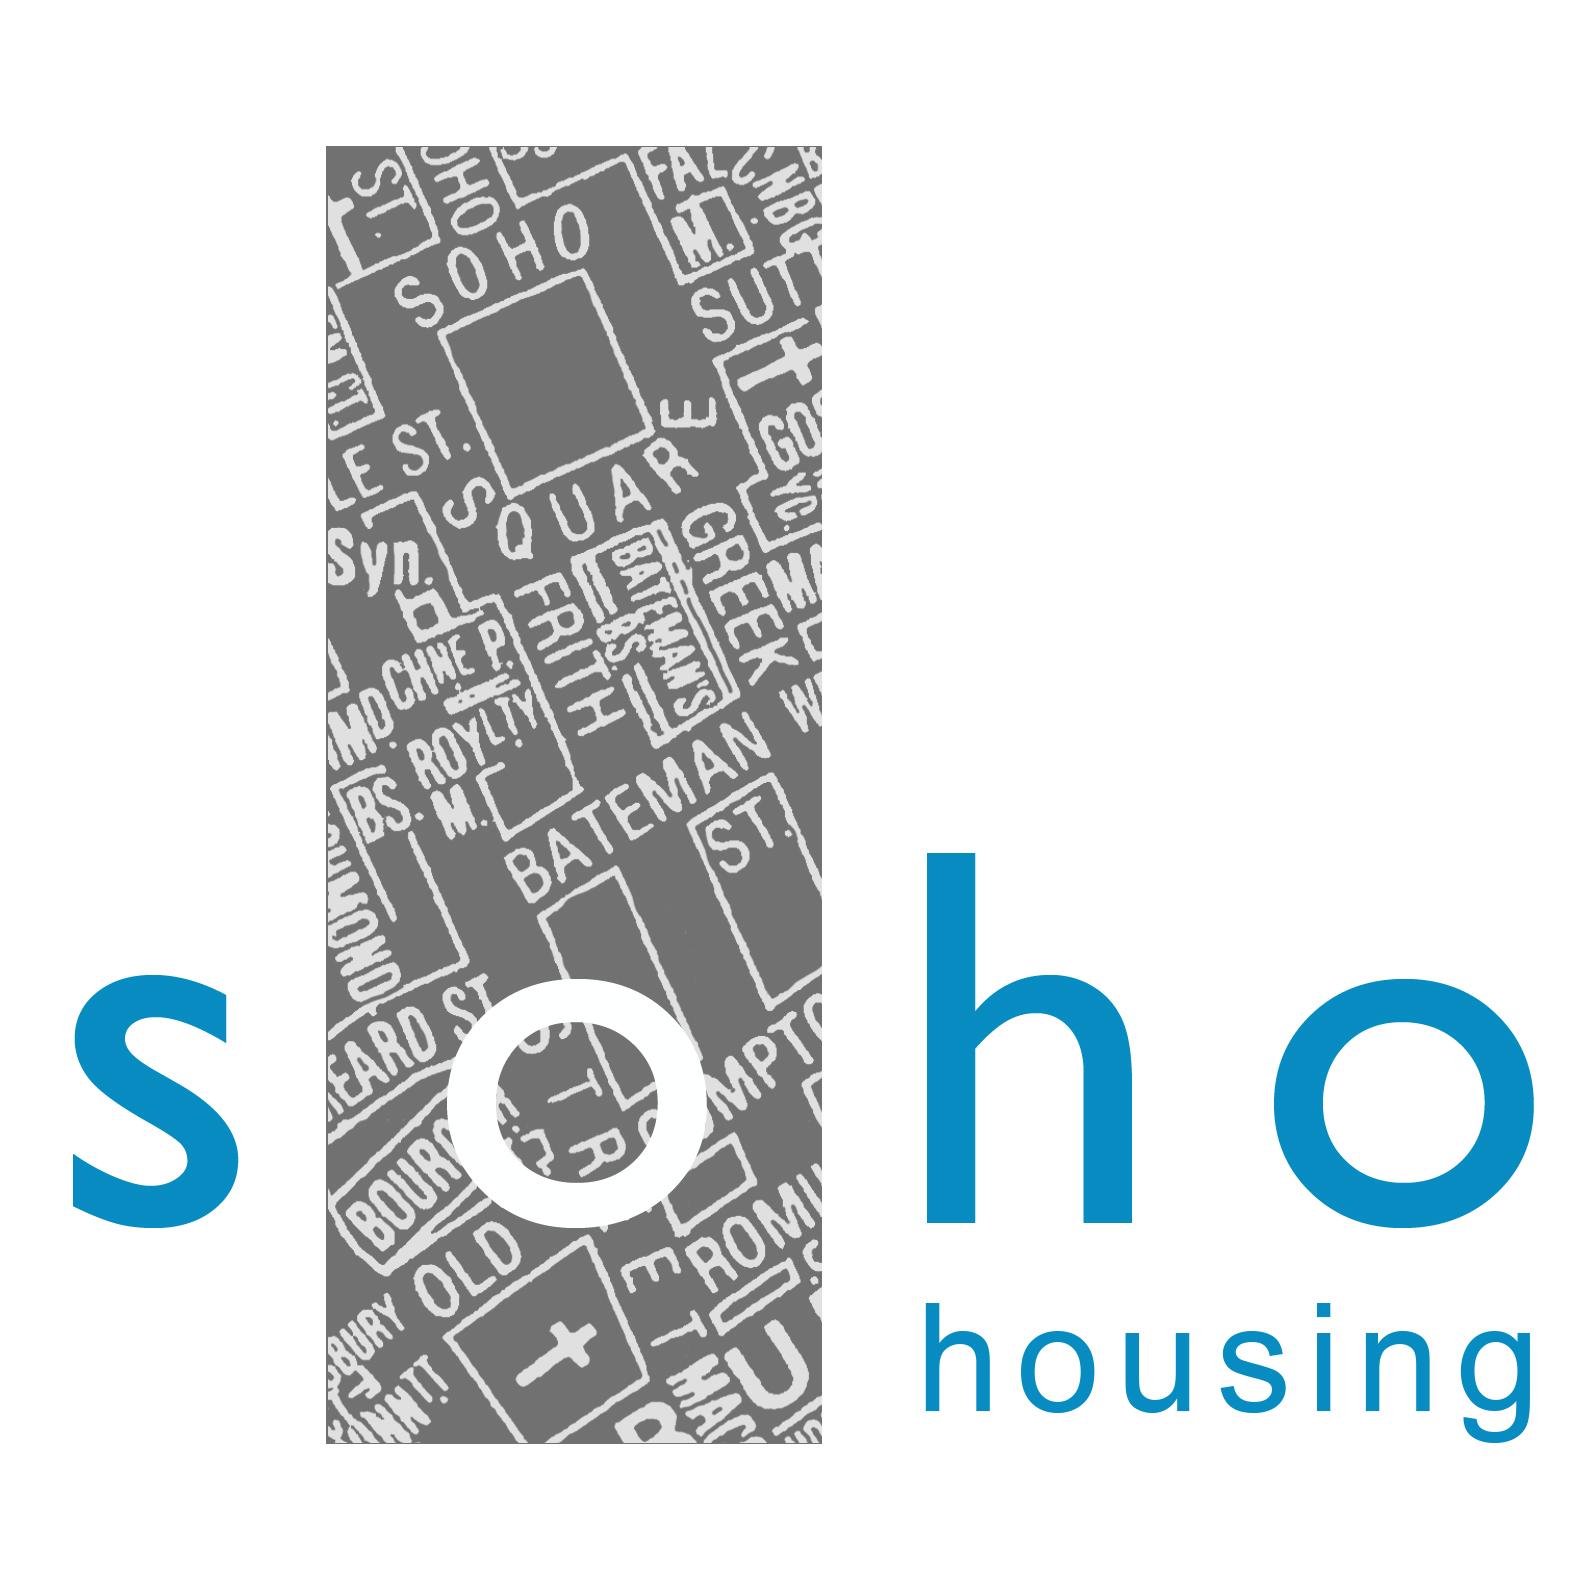 Soho Housing